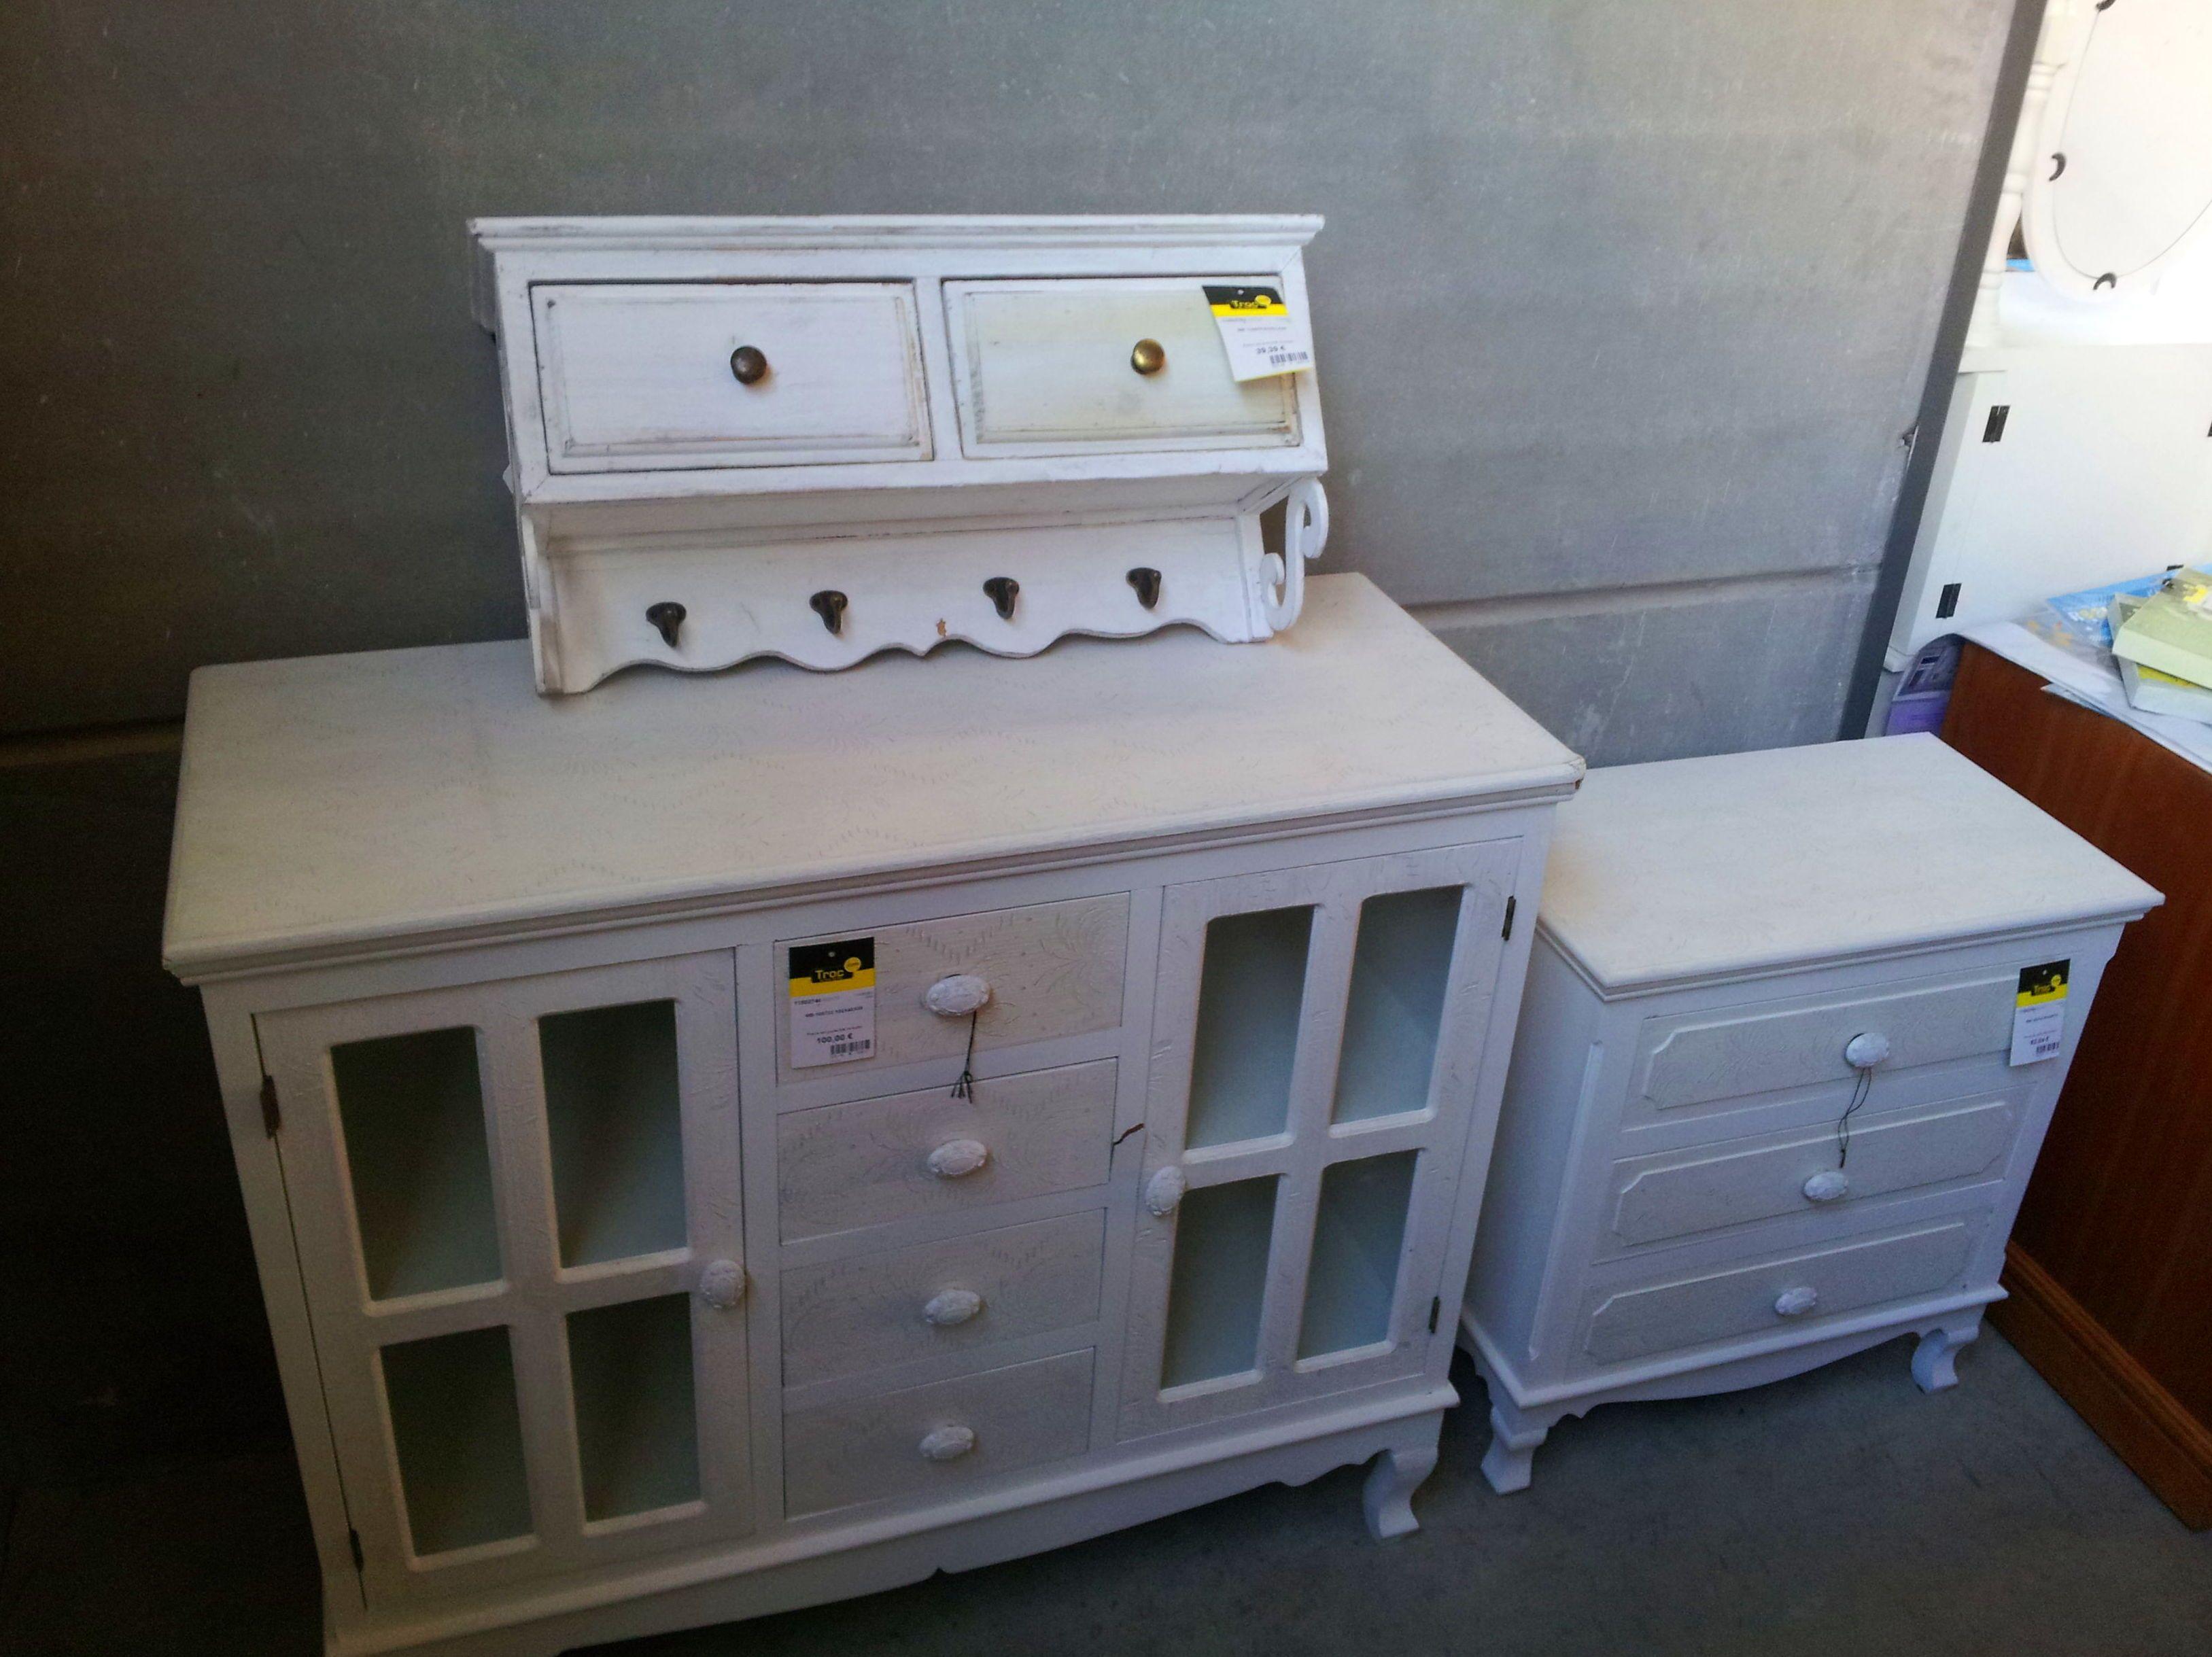 Segunda mano mallorca muebles trendy elegant decoracion - Muebles de segunda mano en palma de mallorca ...